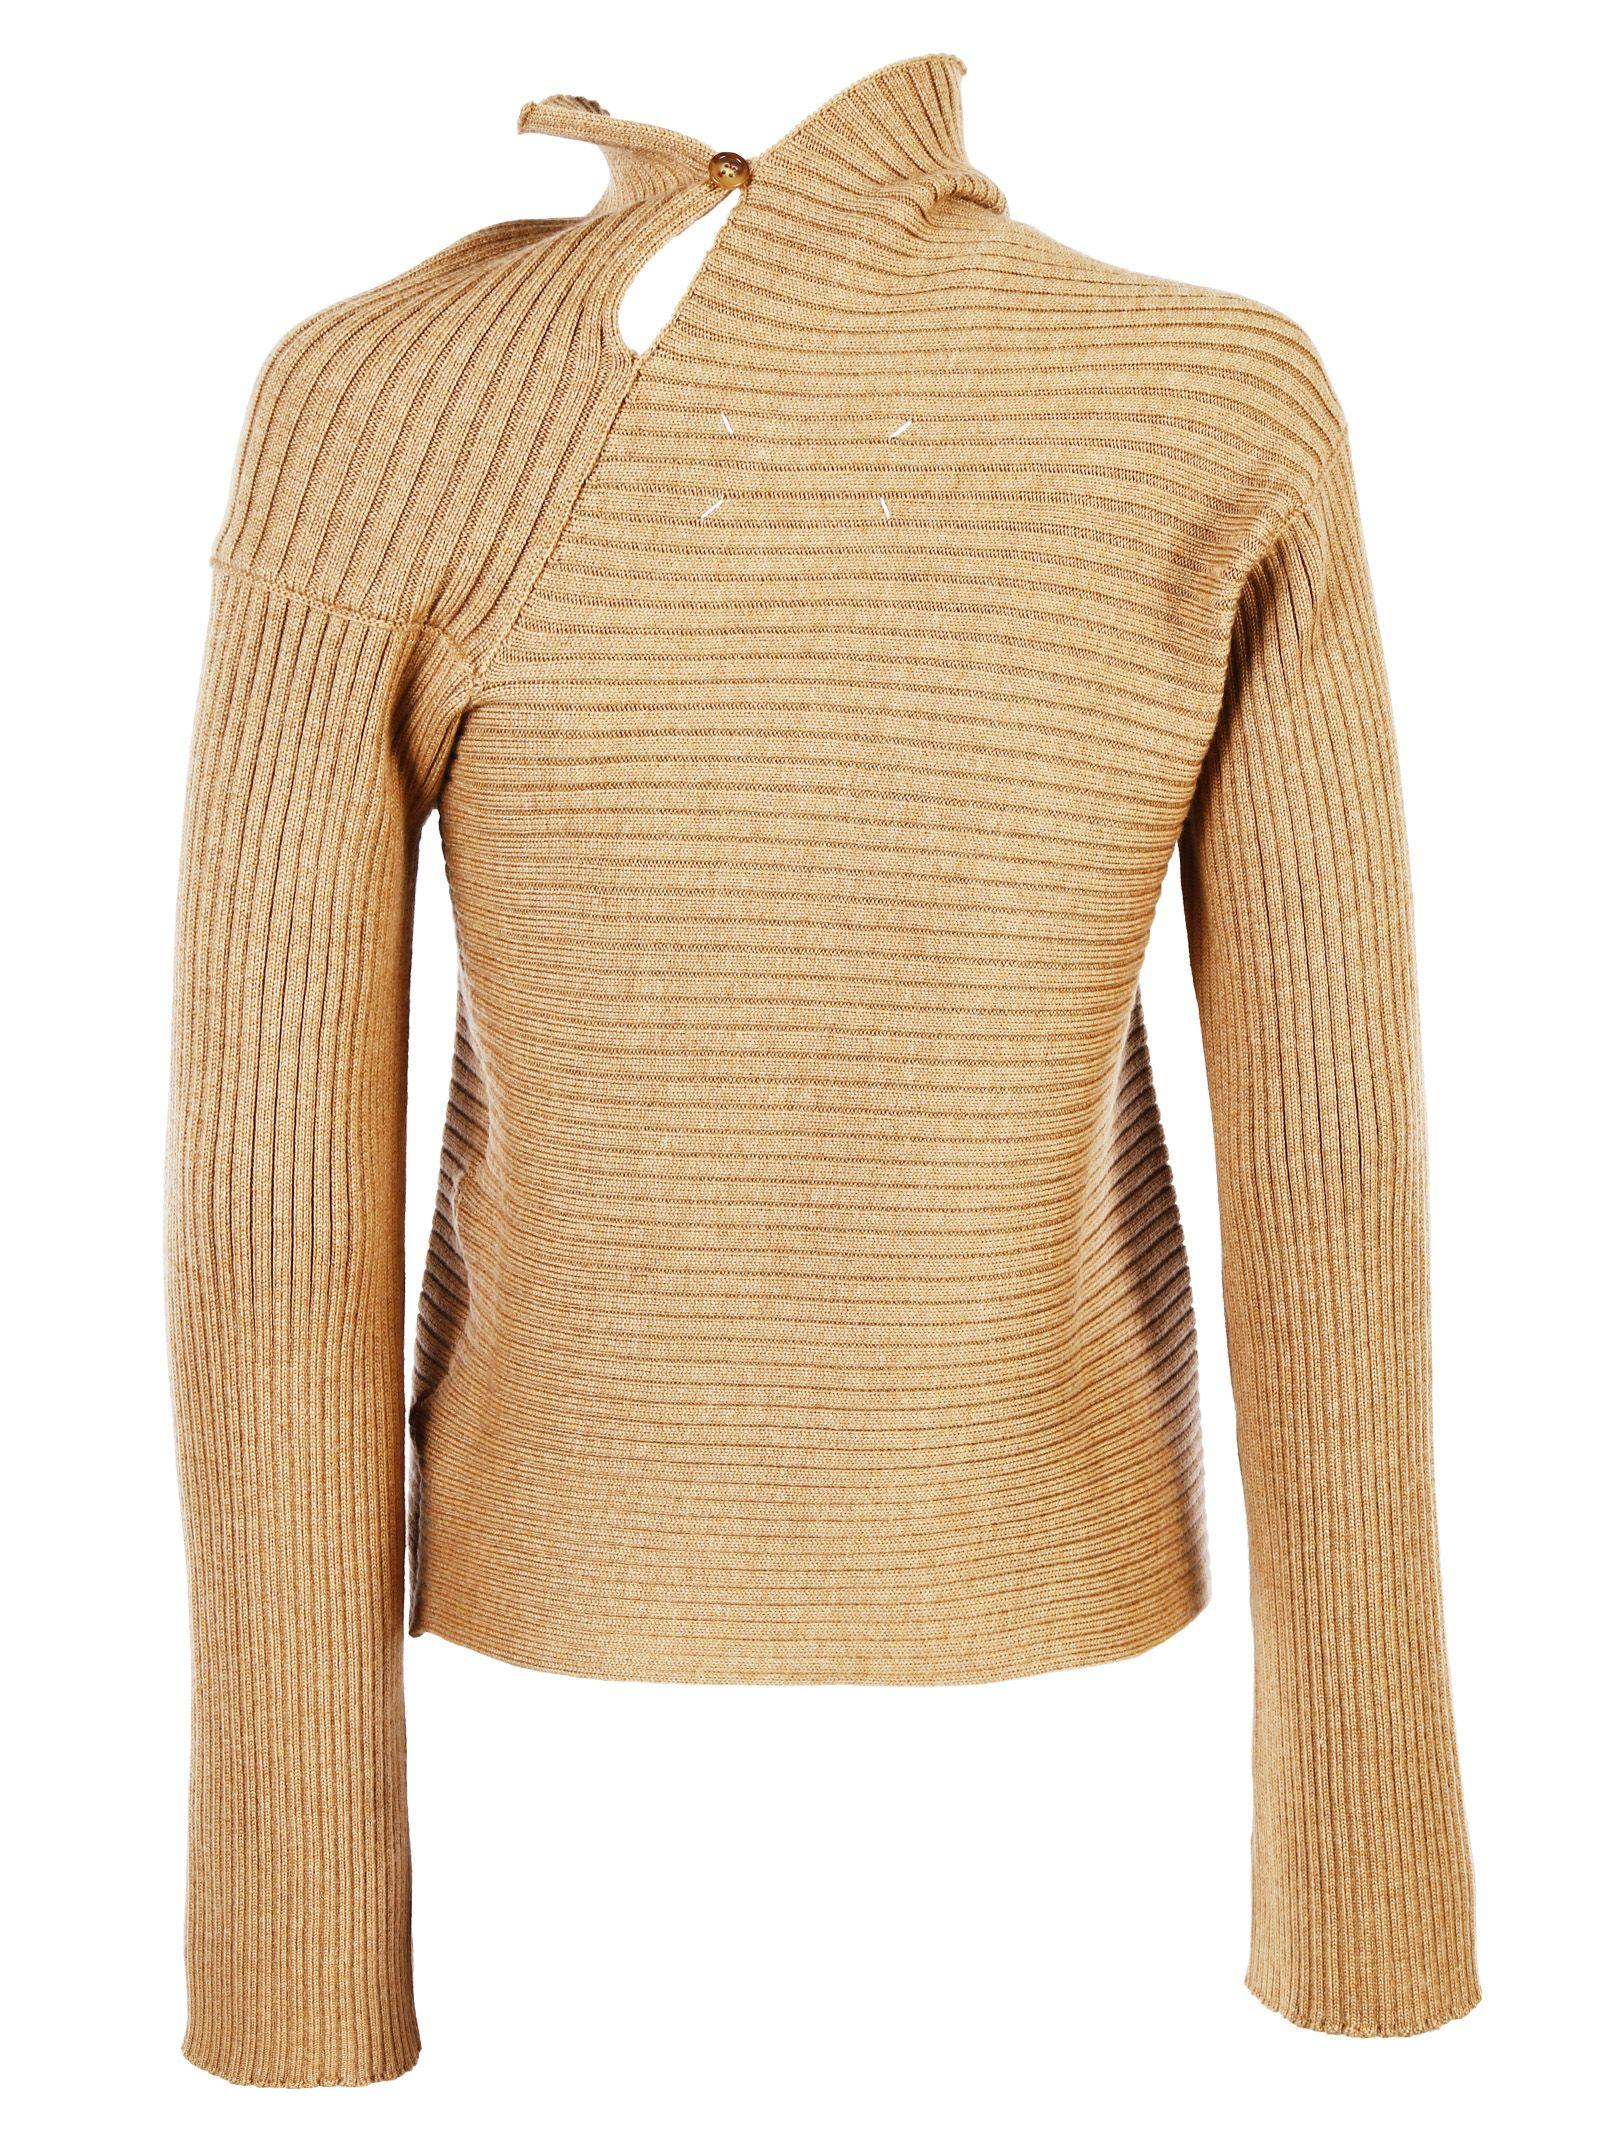 Maison Margiela - Maison Margiela Wool Ribbed Knit Asymmetric ...